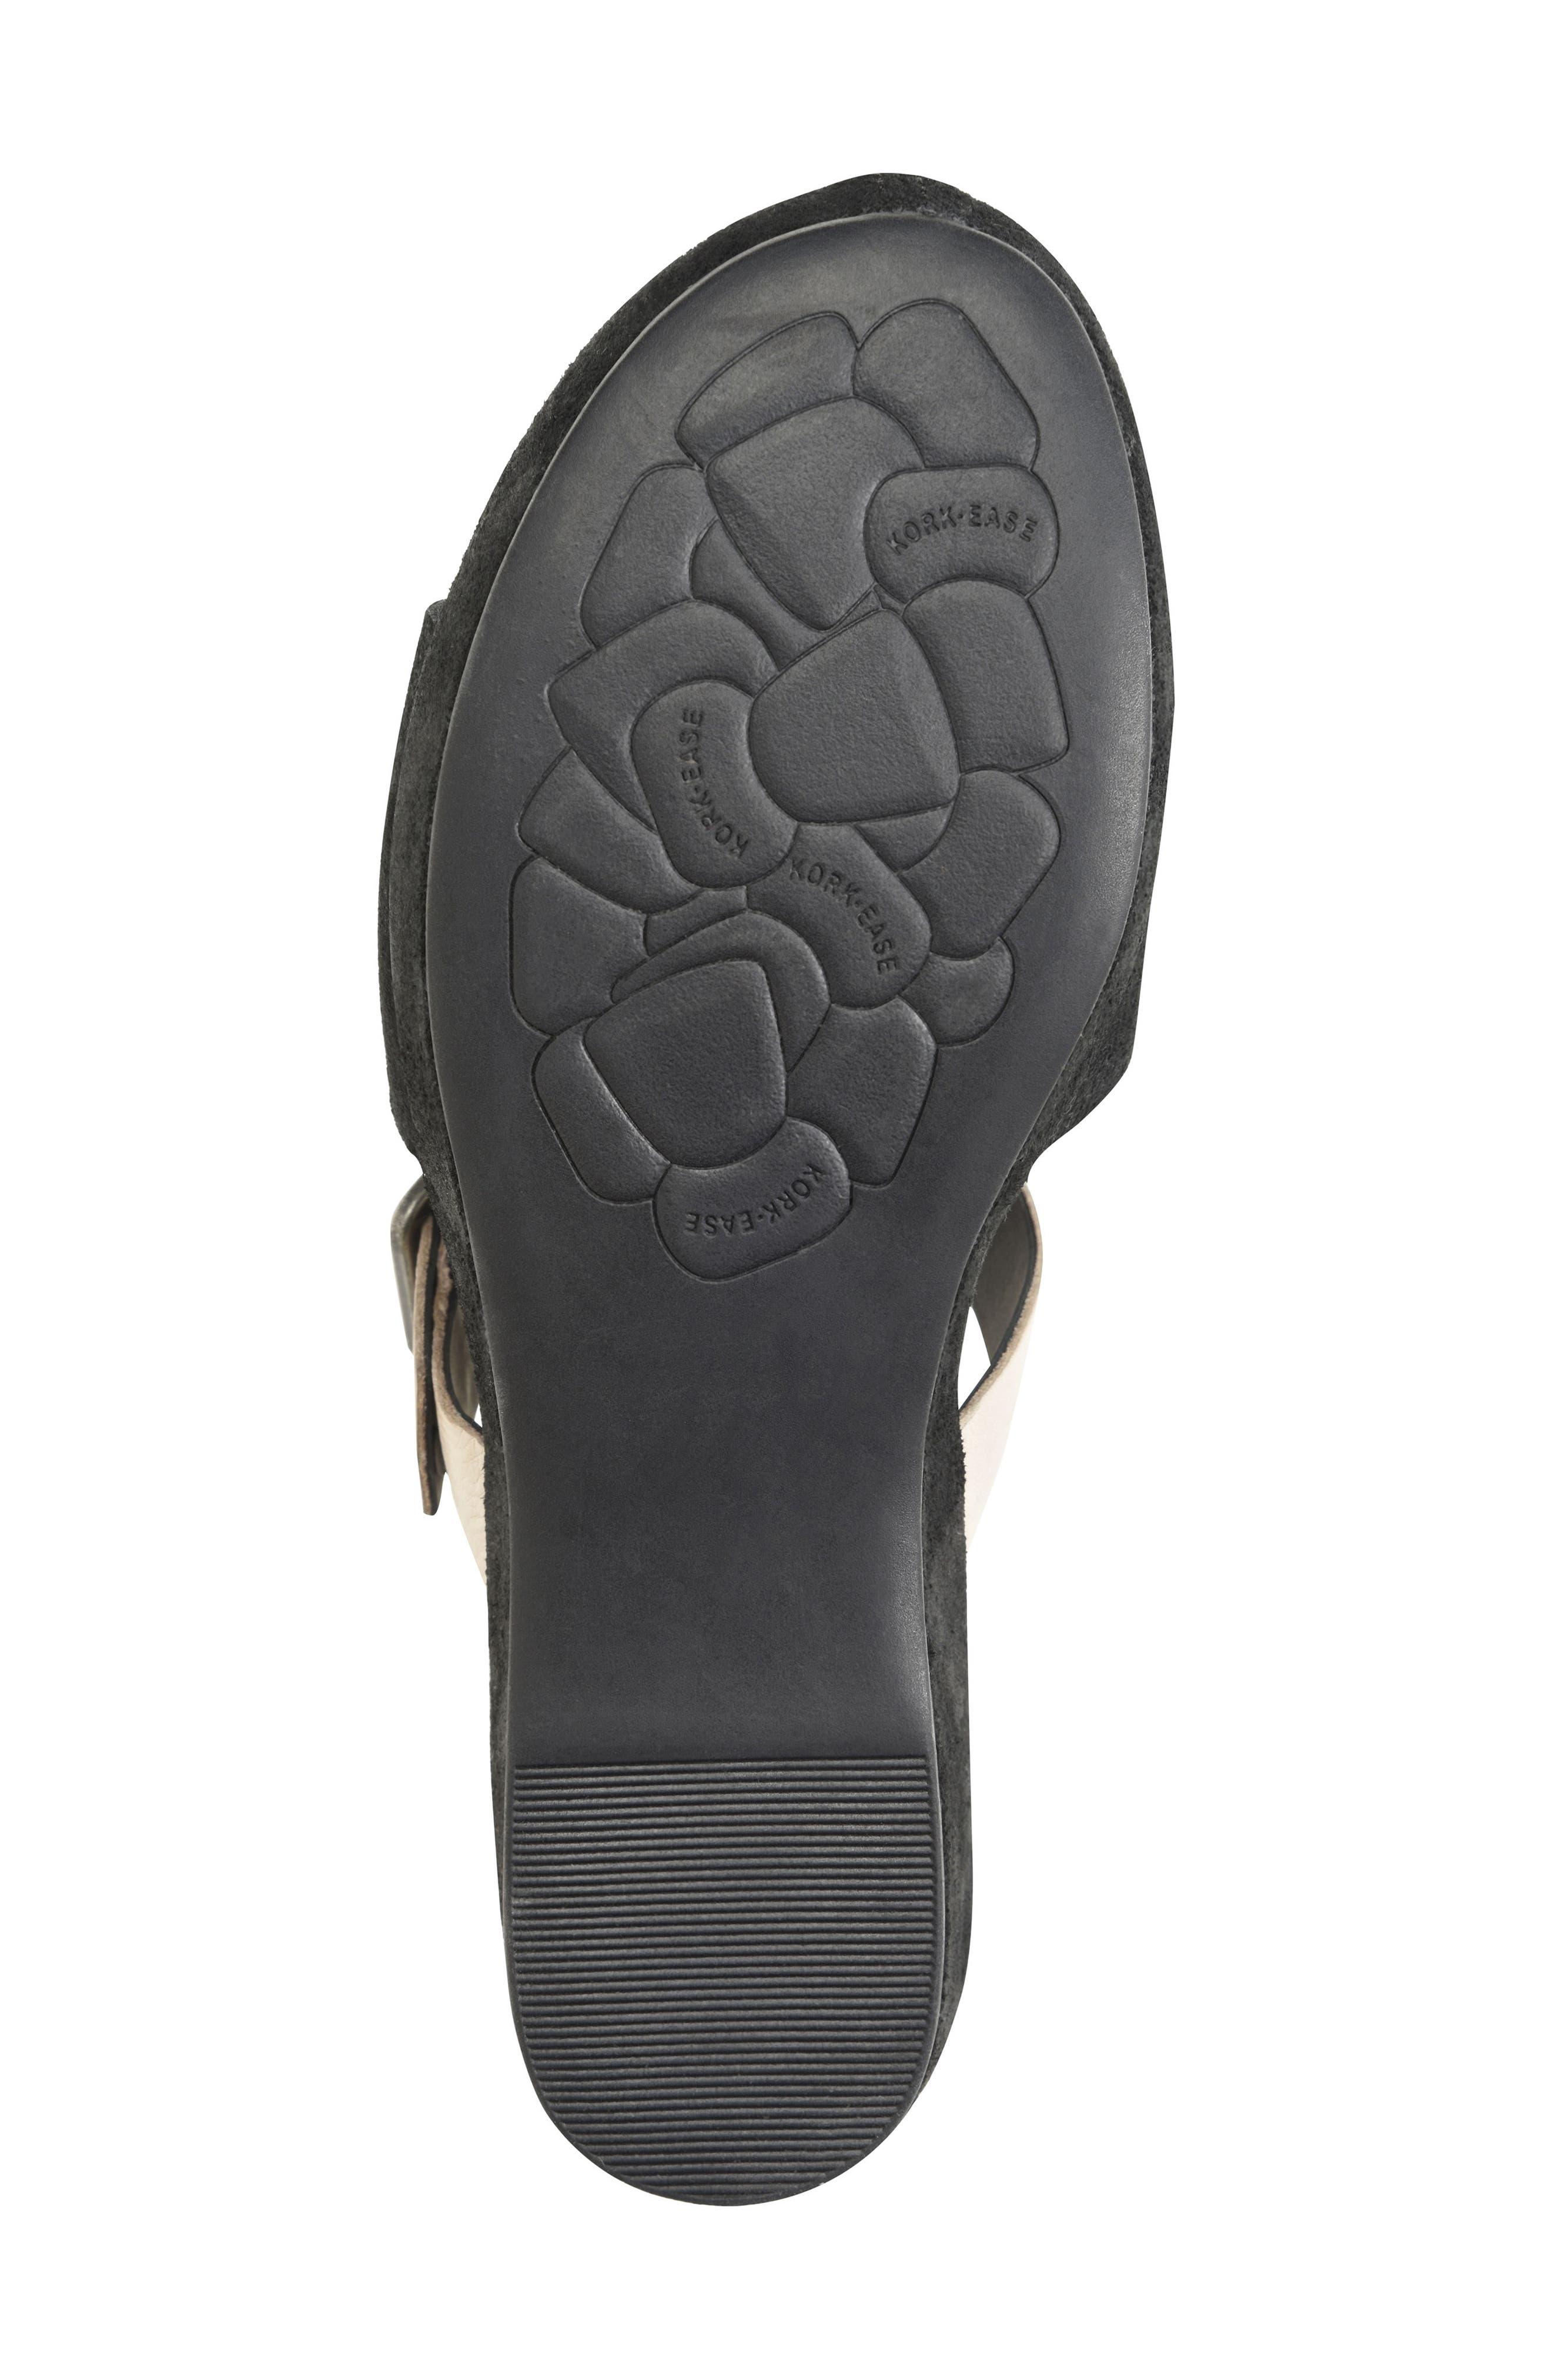 Bisti Wedge Slide Sandal,                             Alternate thumbnail 5, color,                             BLACK/ GREY LEATHER